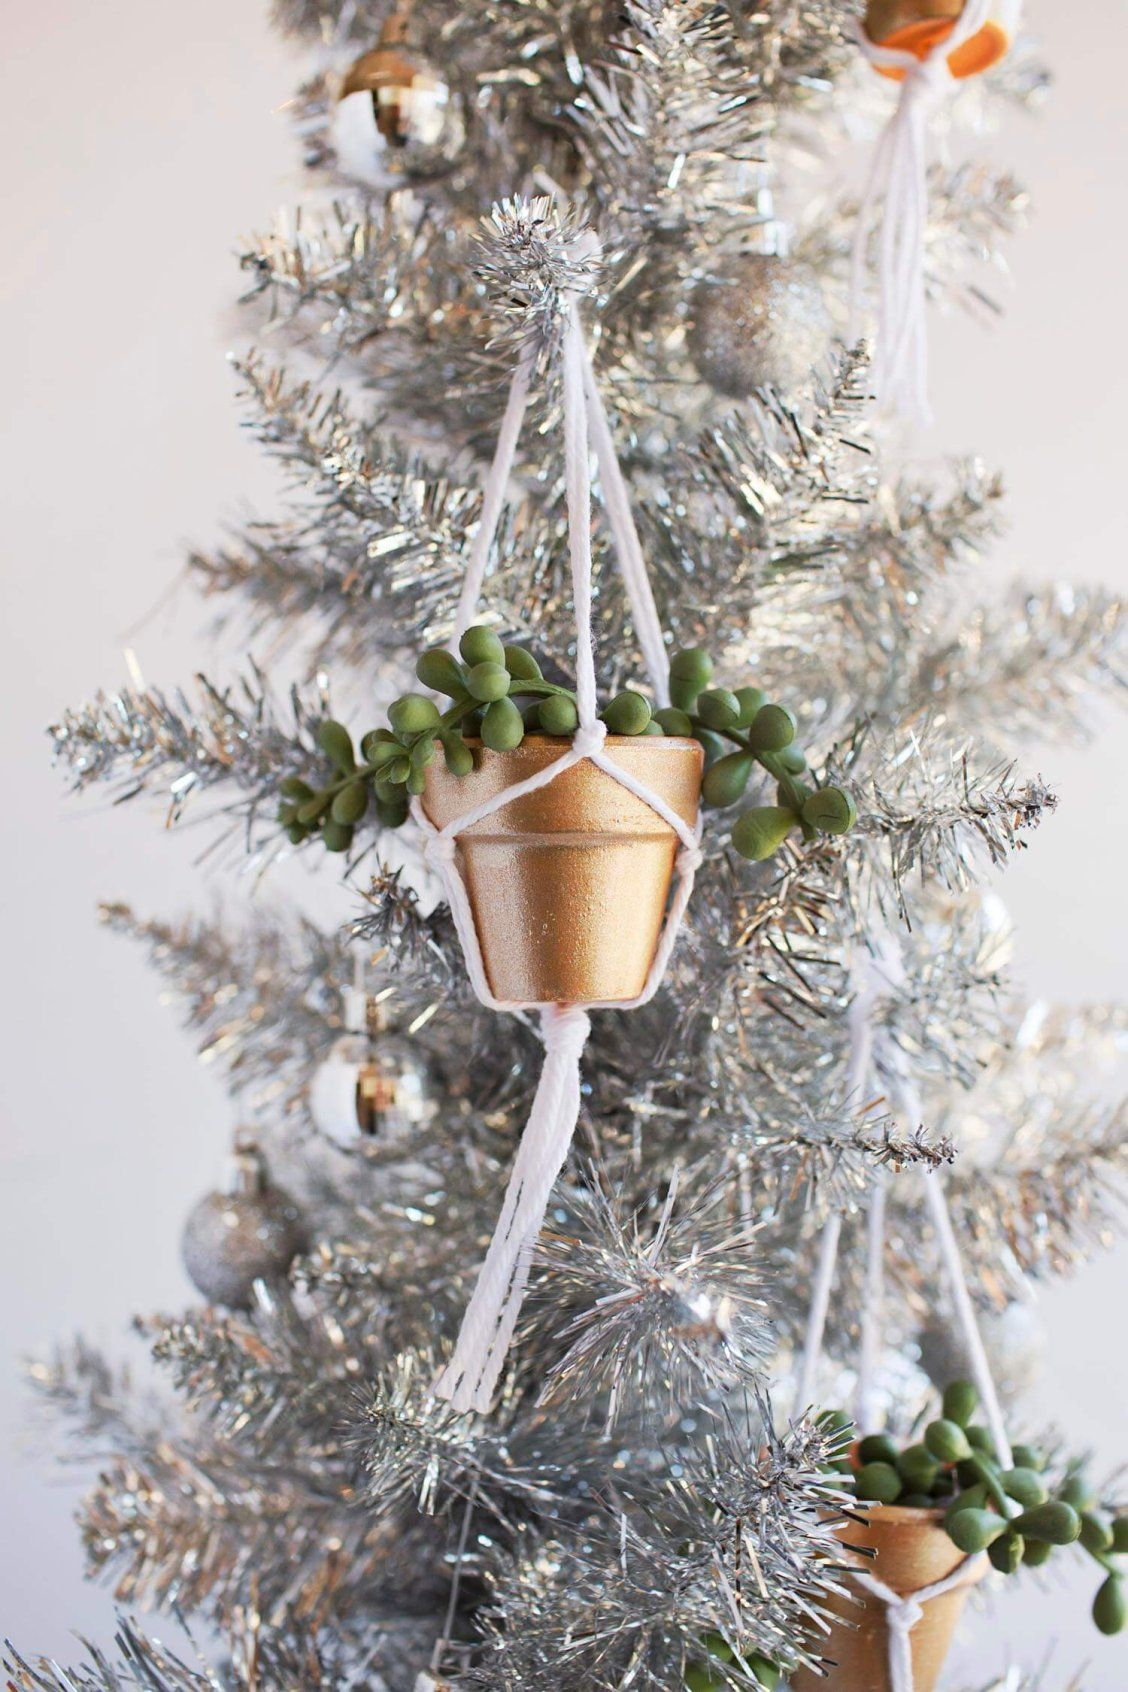 DIY Hanging Planter Ornament Diy hanging planter, Diy